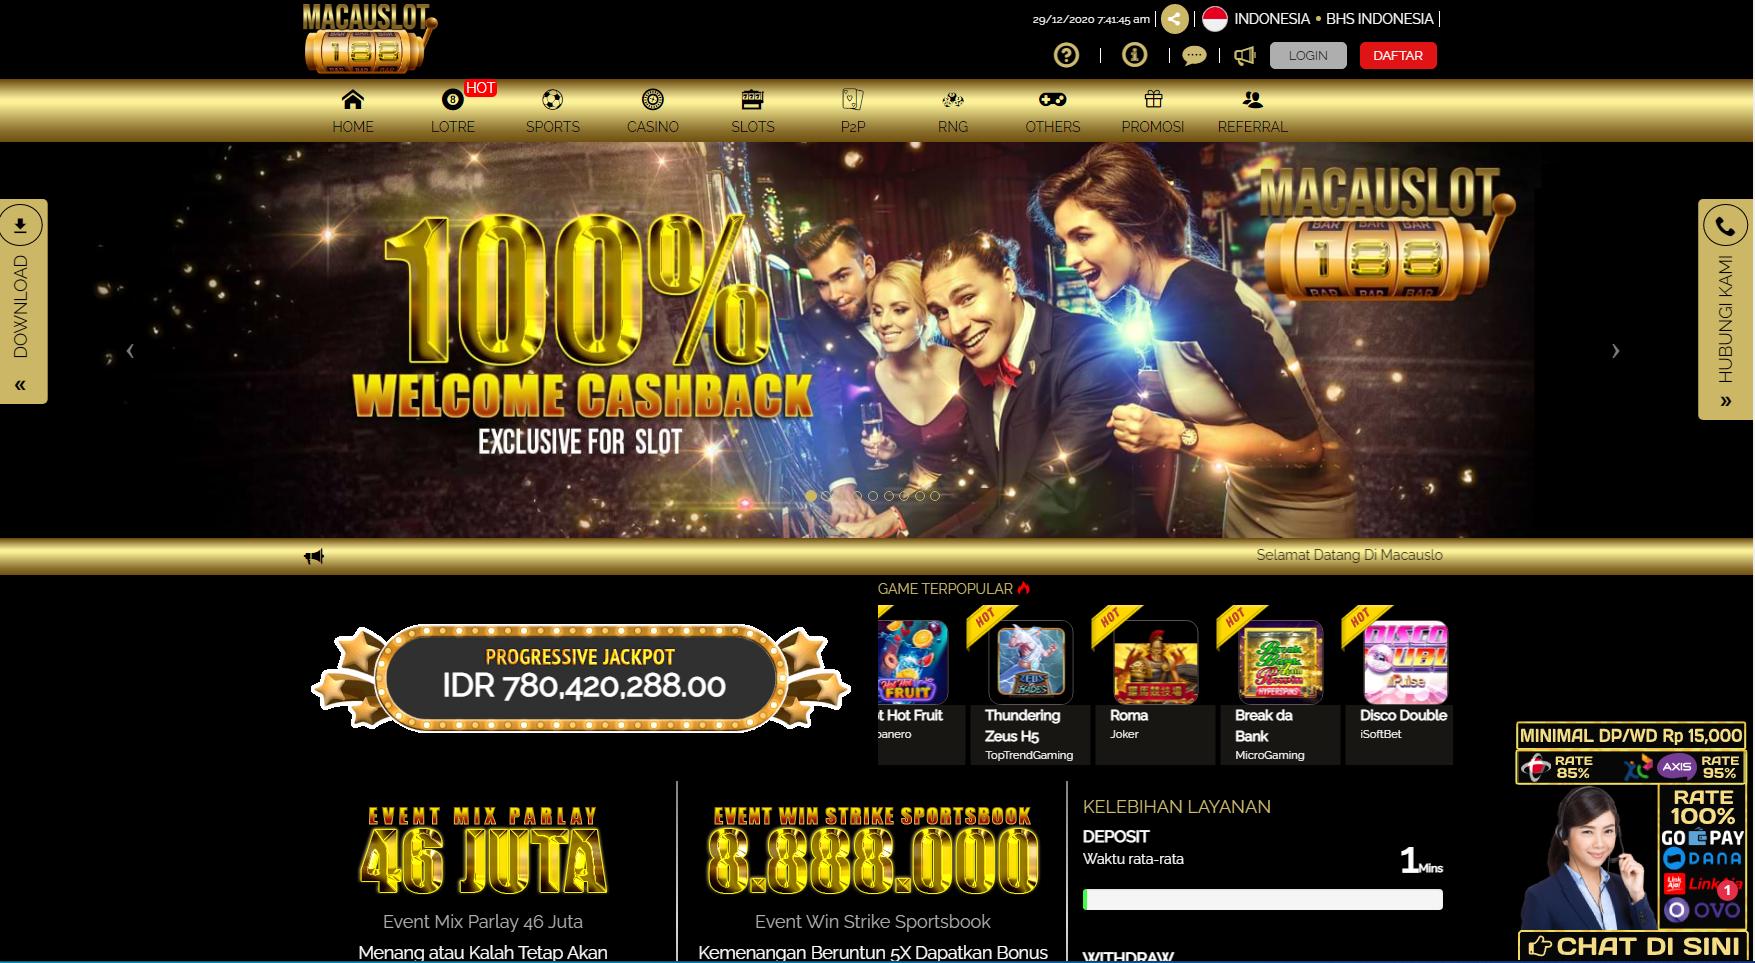 Macauslot188 Situs Slot Spadegaming Bank Bri 24 Jam Profile Egg Hatch Now Com Forum